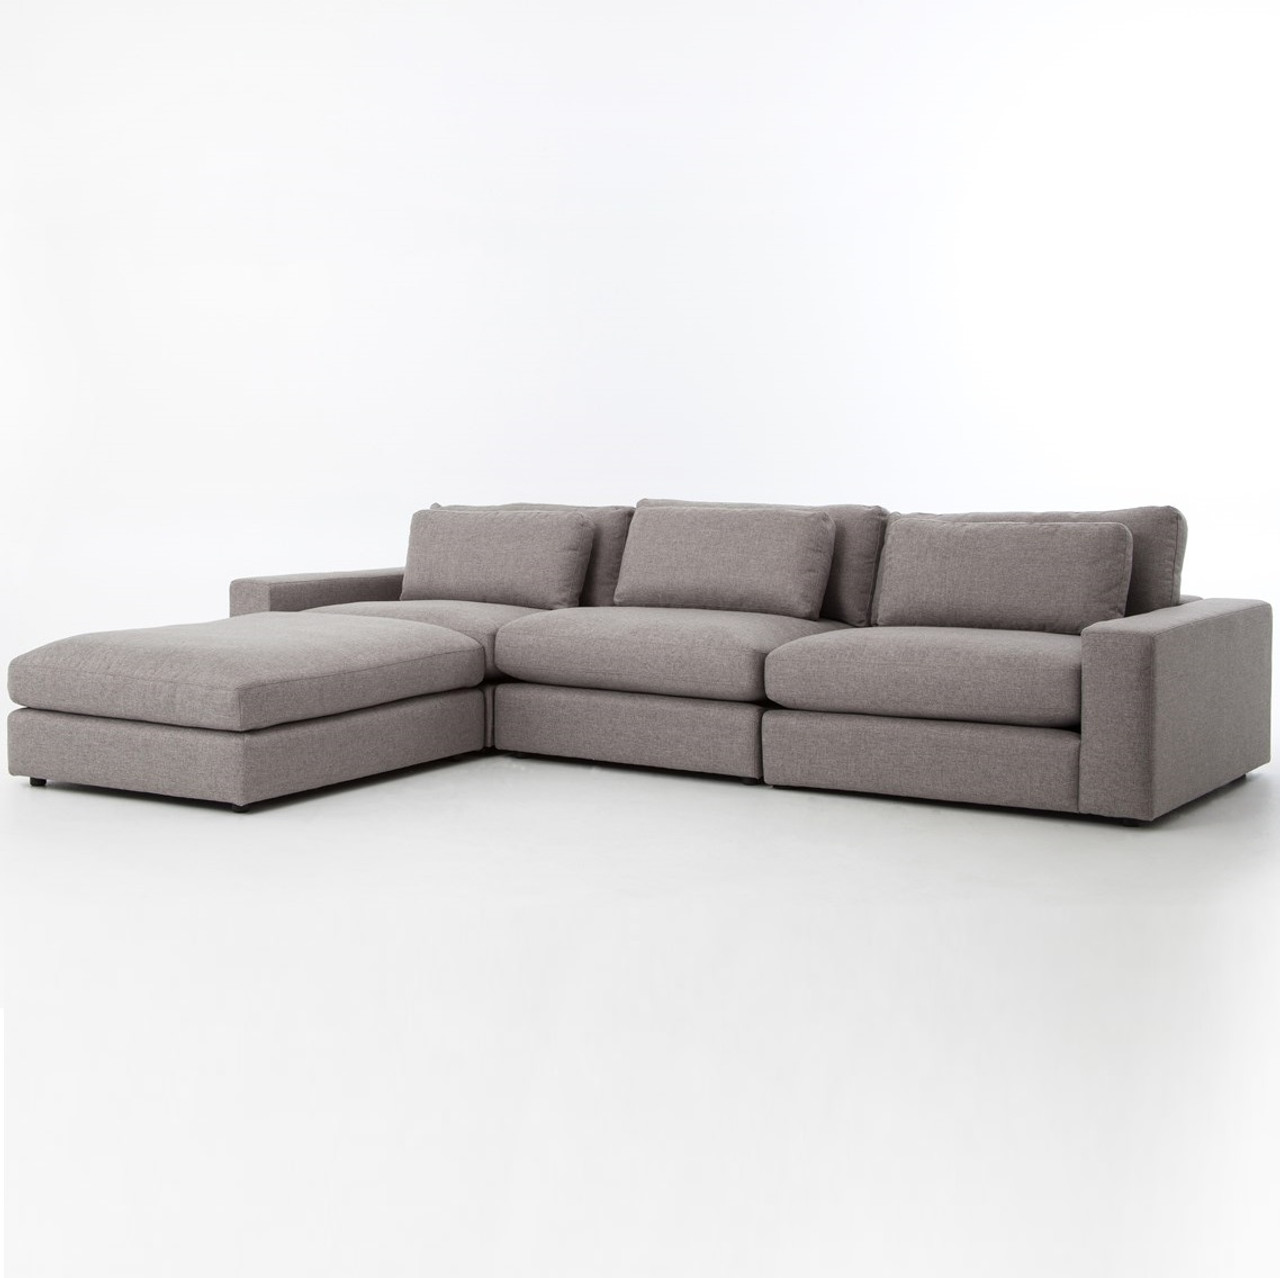 Bloor Gray Contemporary 4 Piece Sectional Sofa Zin Home